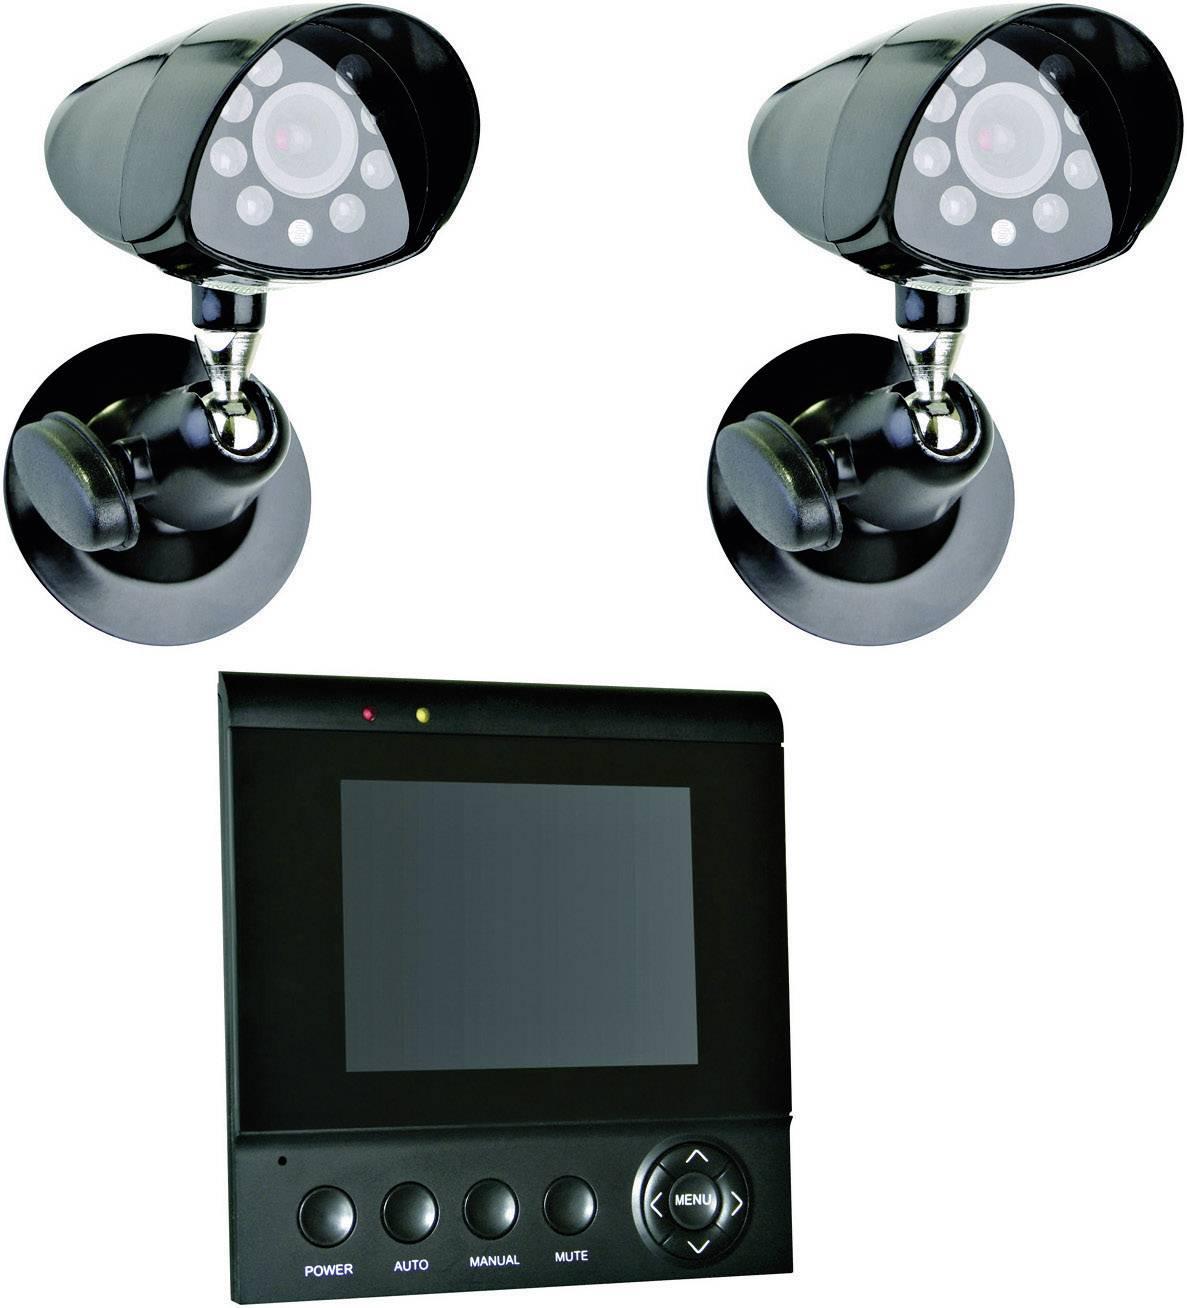 Monitorovací kamera s TFT displejem Elro, CS72SEC, 1kanálová, 320 x 240 px